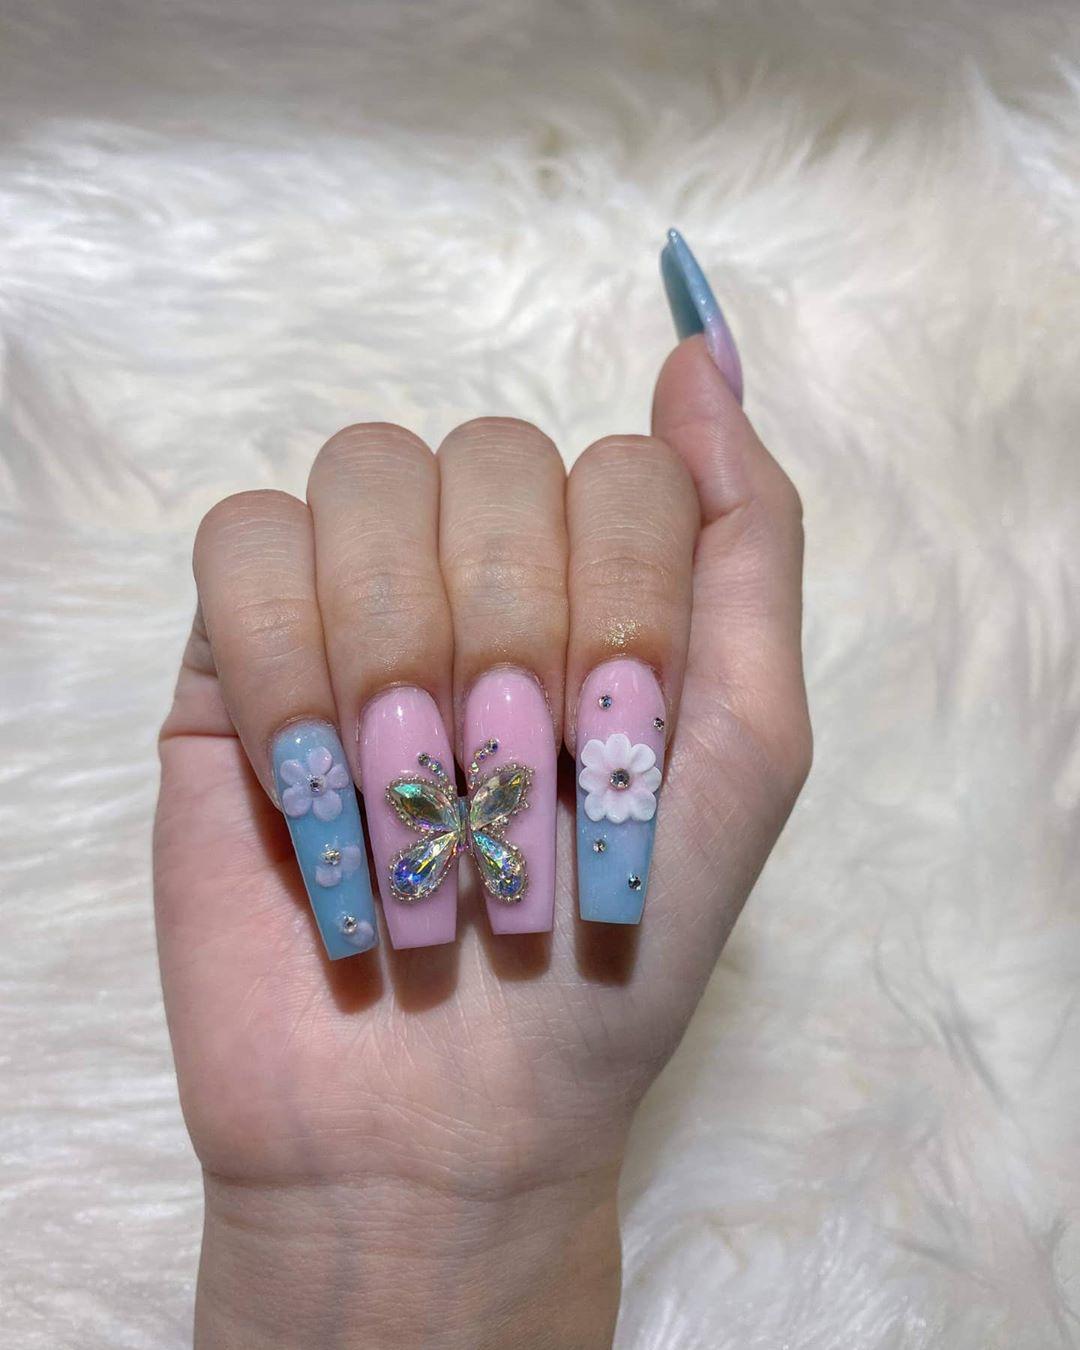 Pink and Blue Nailpolish Matt Finish with Butterfly Inspired Rhinestones Art